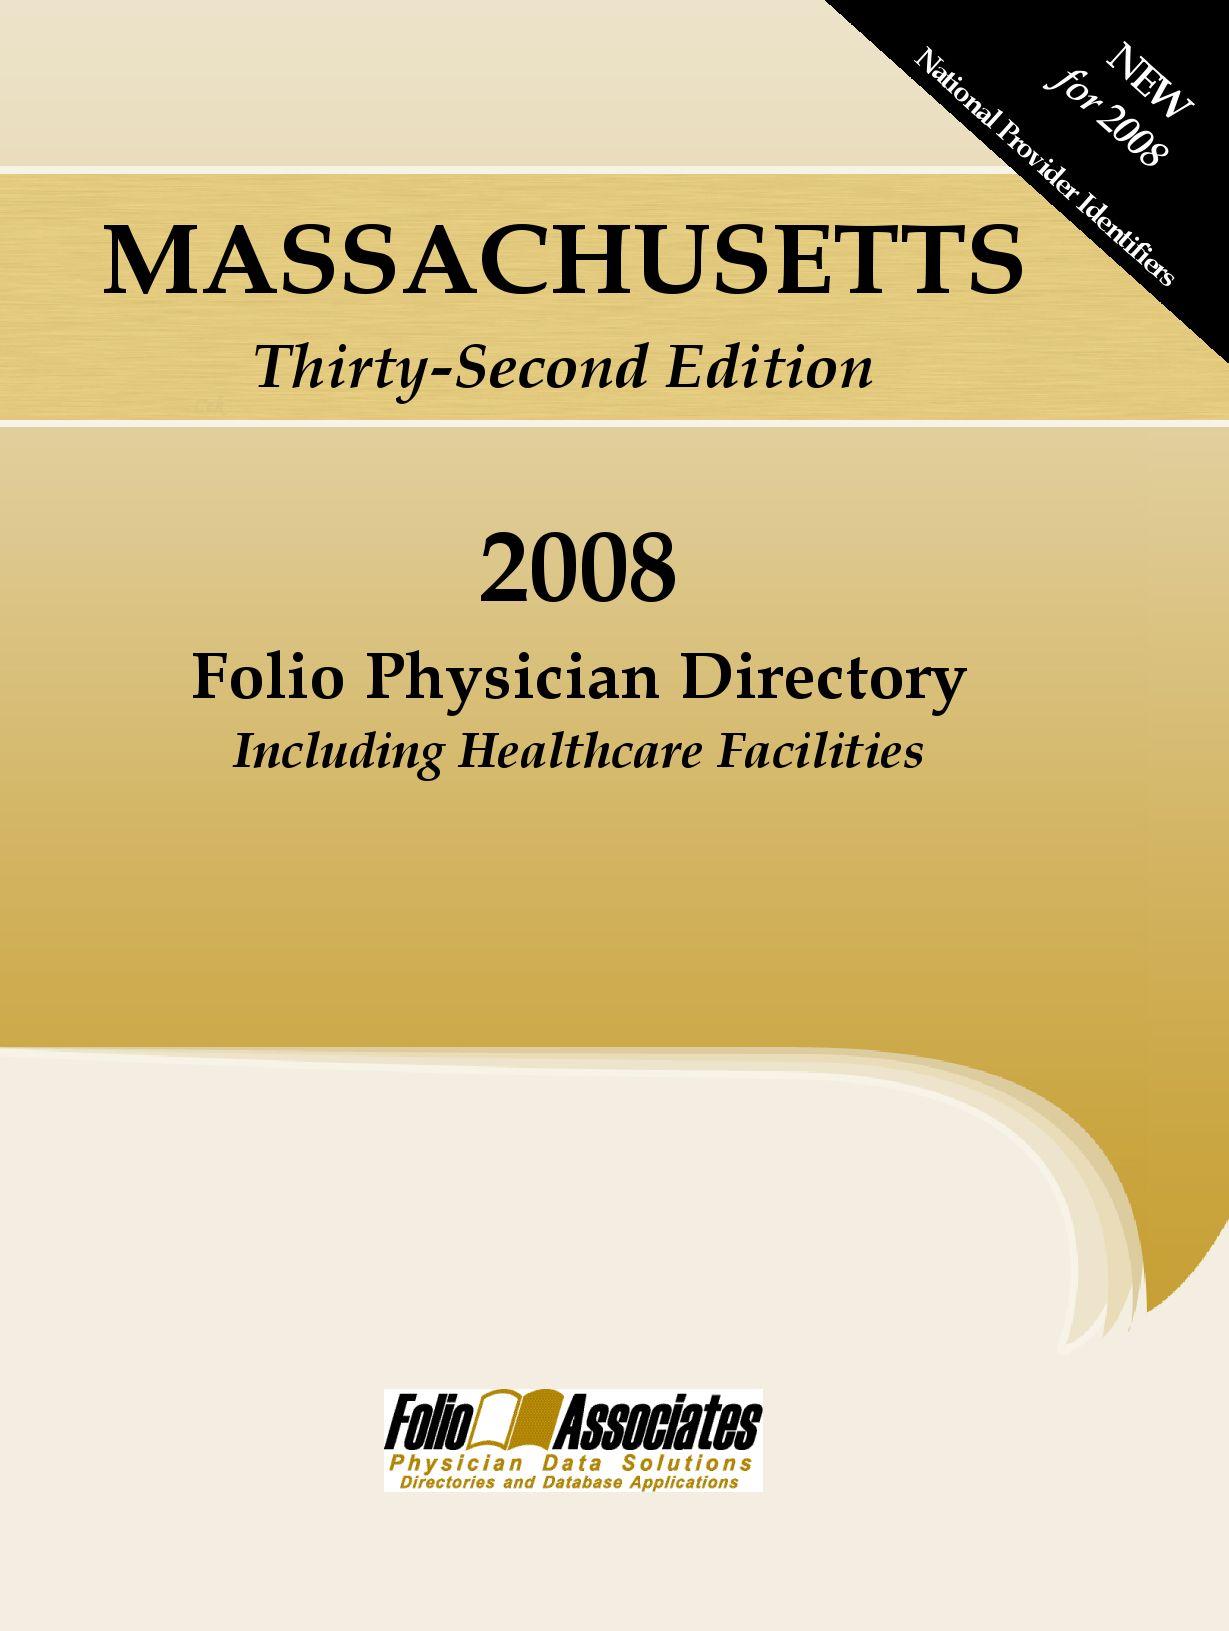 Folio Associates 2008 MA Physician Directory